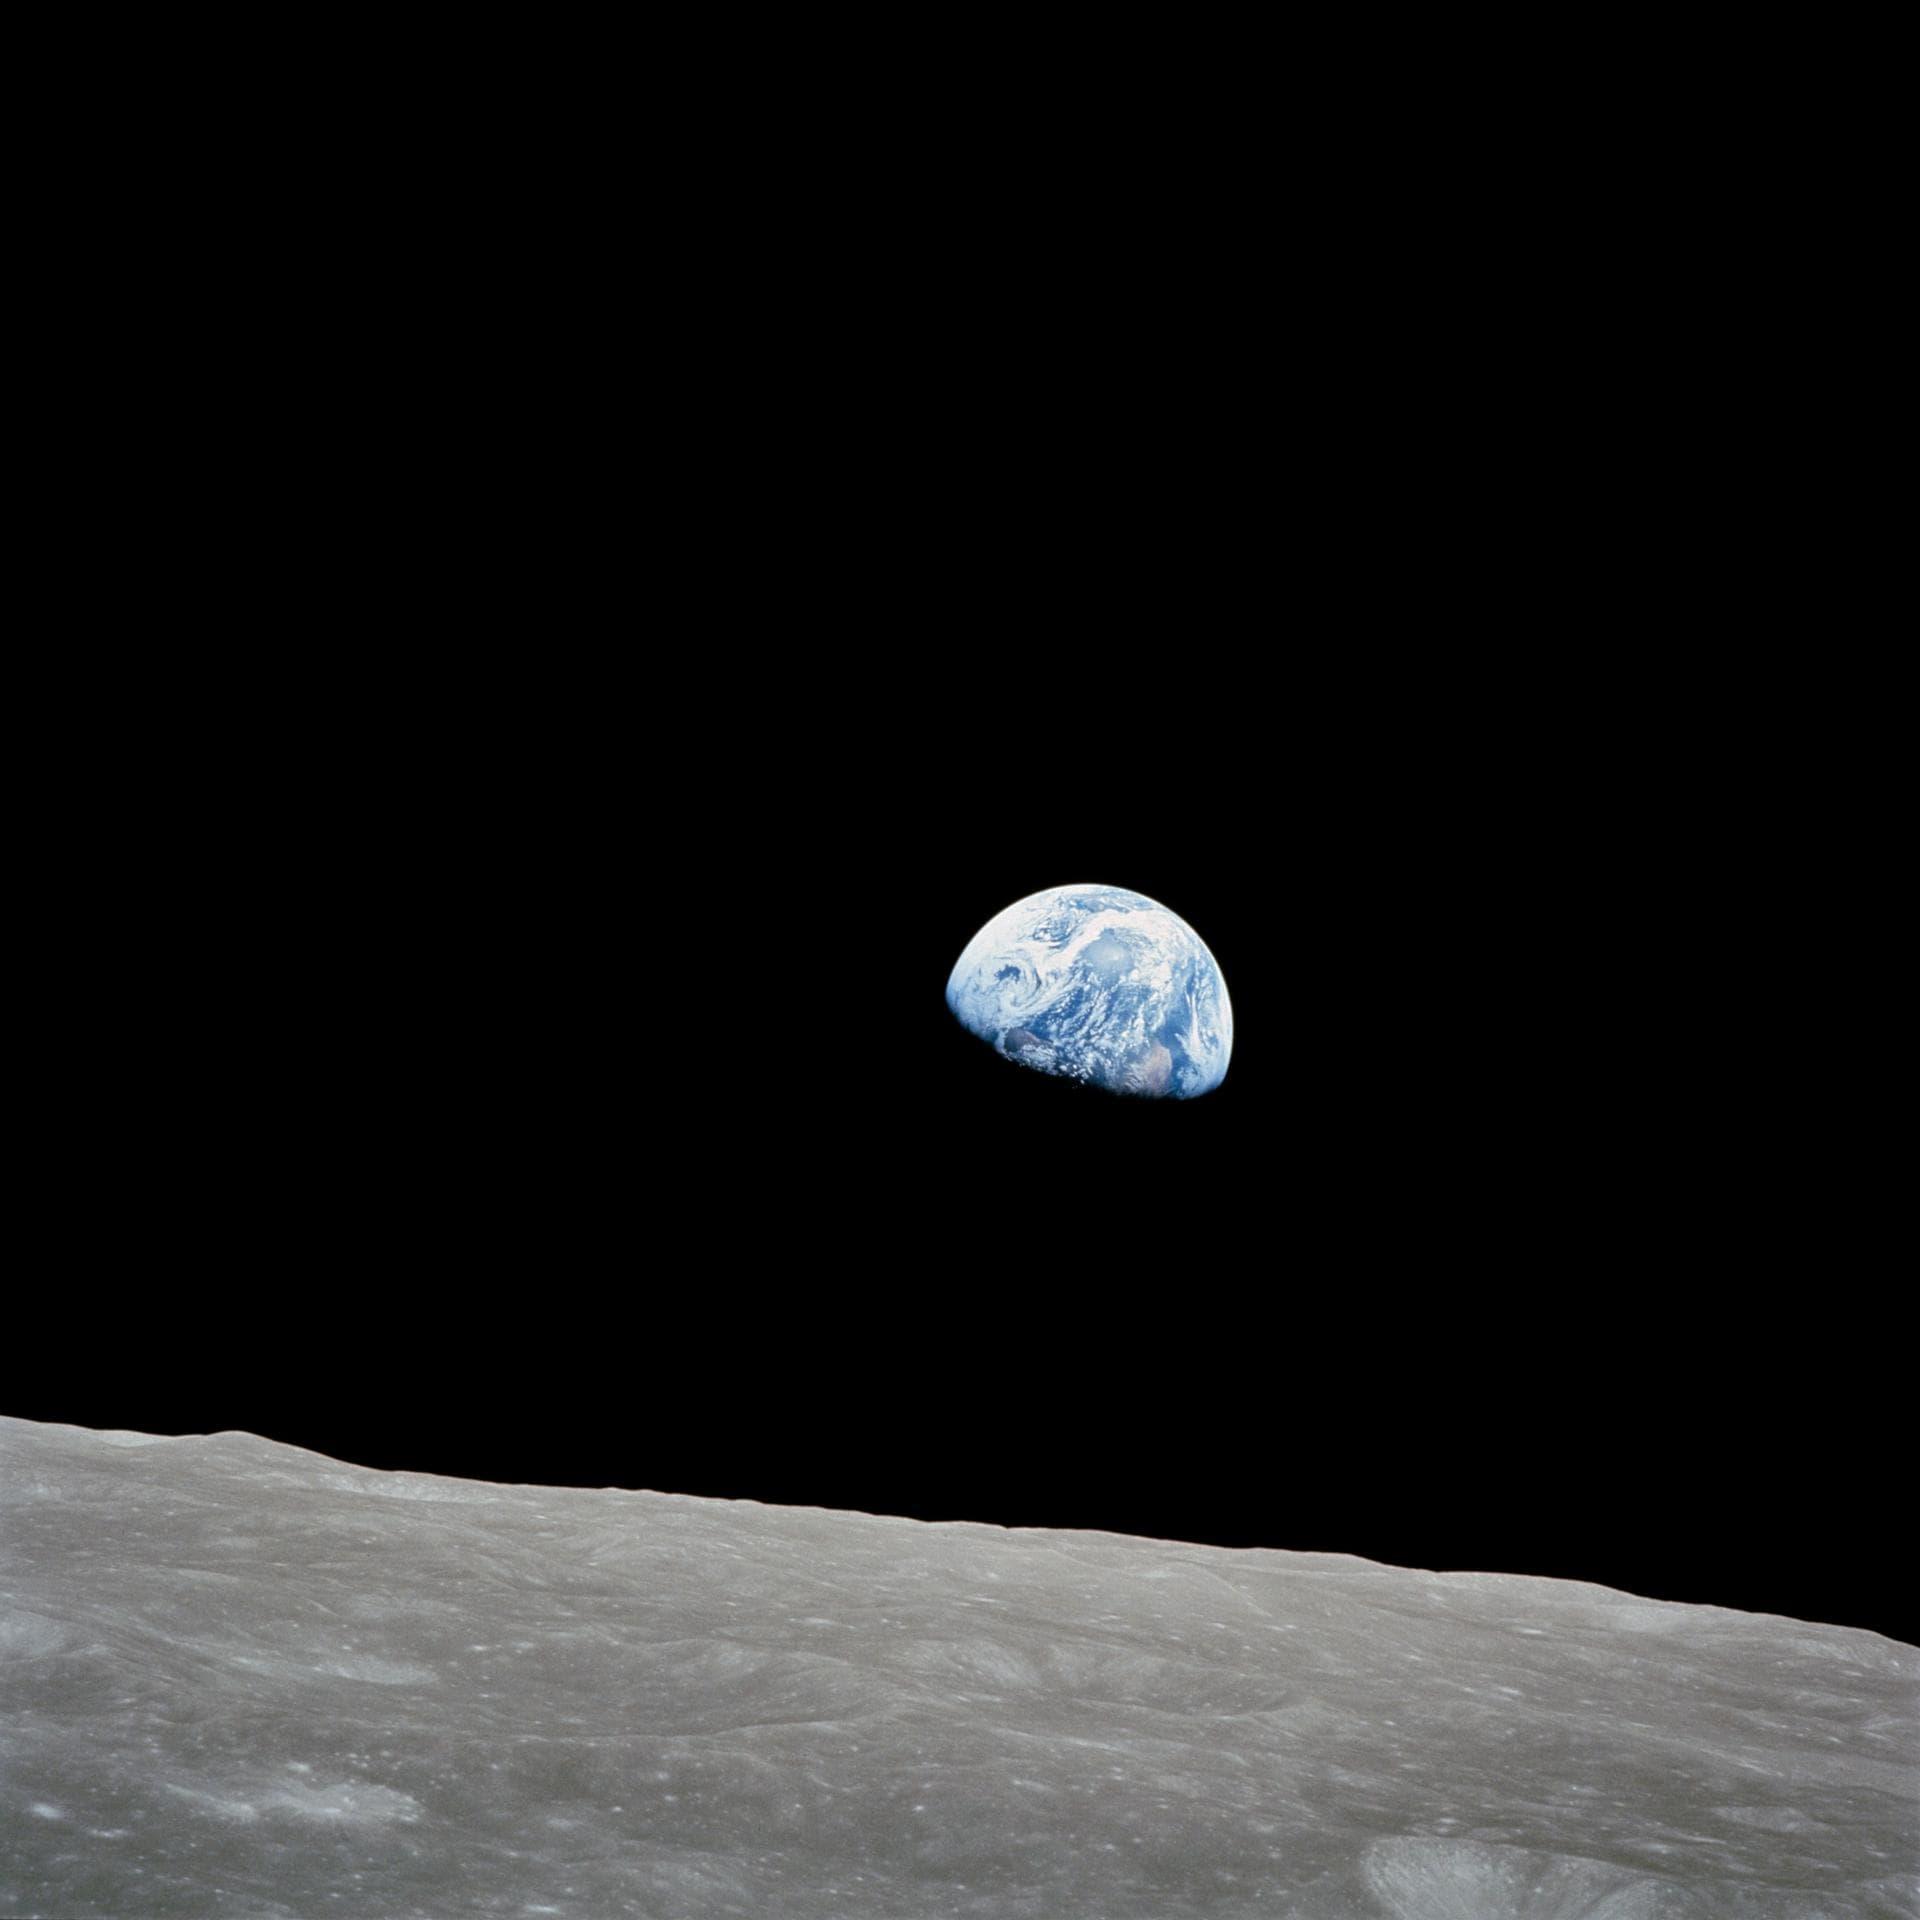 https://cosmonauts.shudooooooon.com/wp-content/uploads/earthrise.jpg